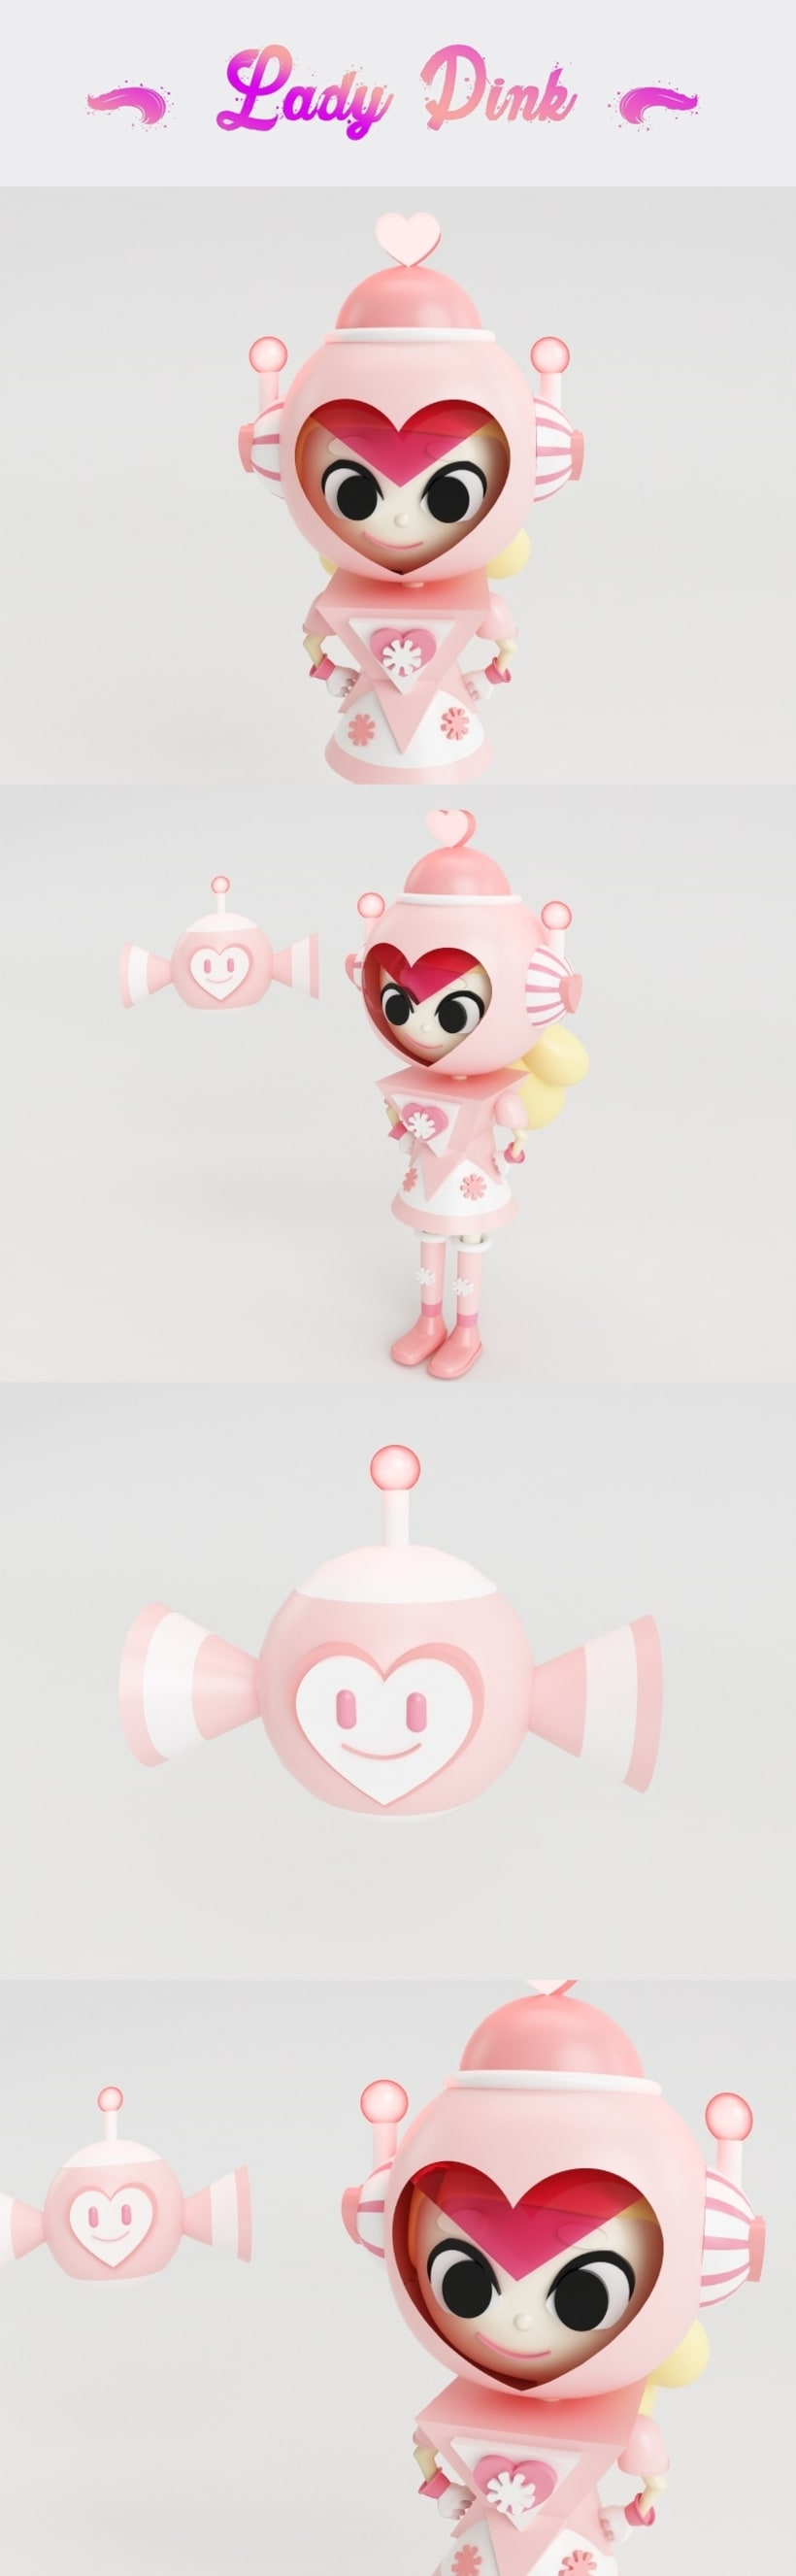 Lady Pink -1